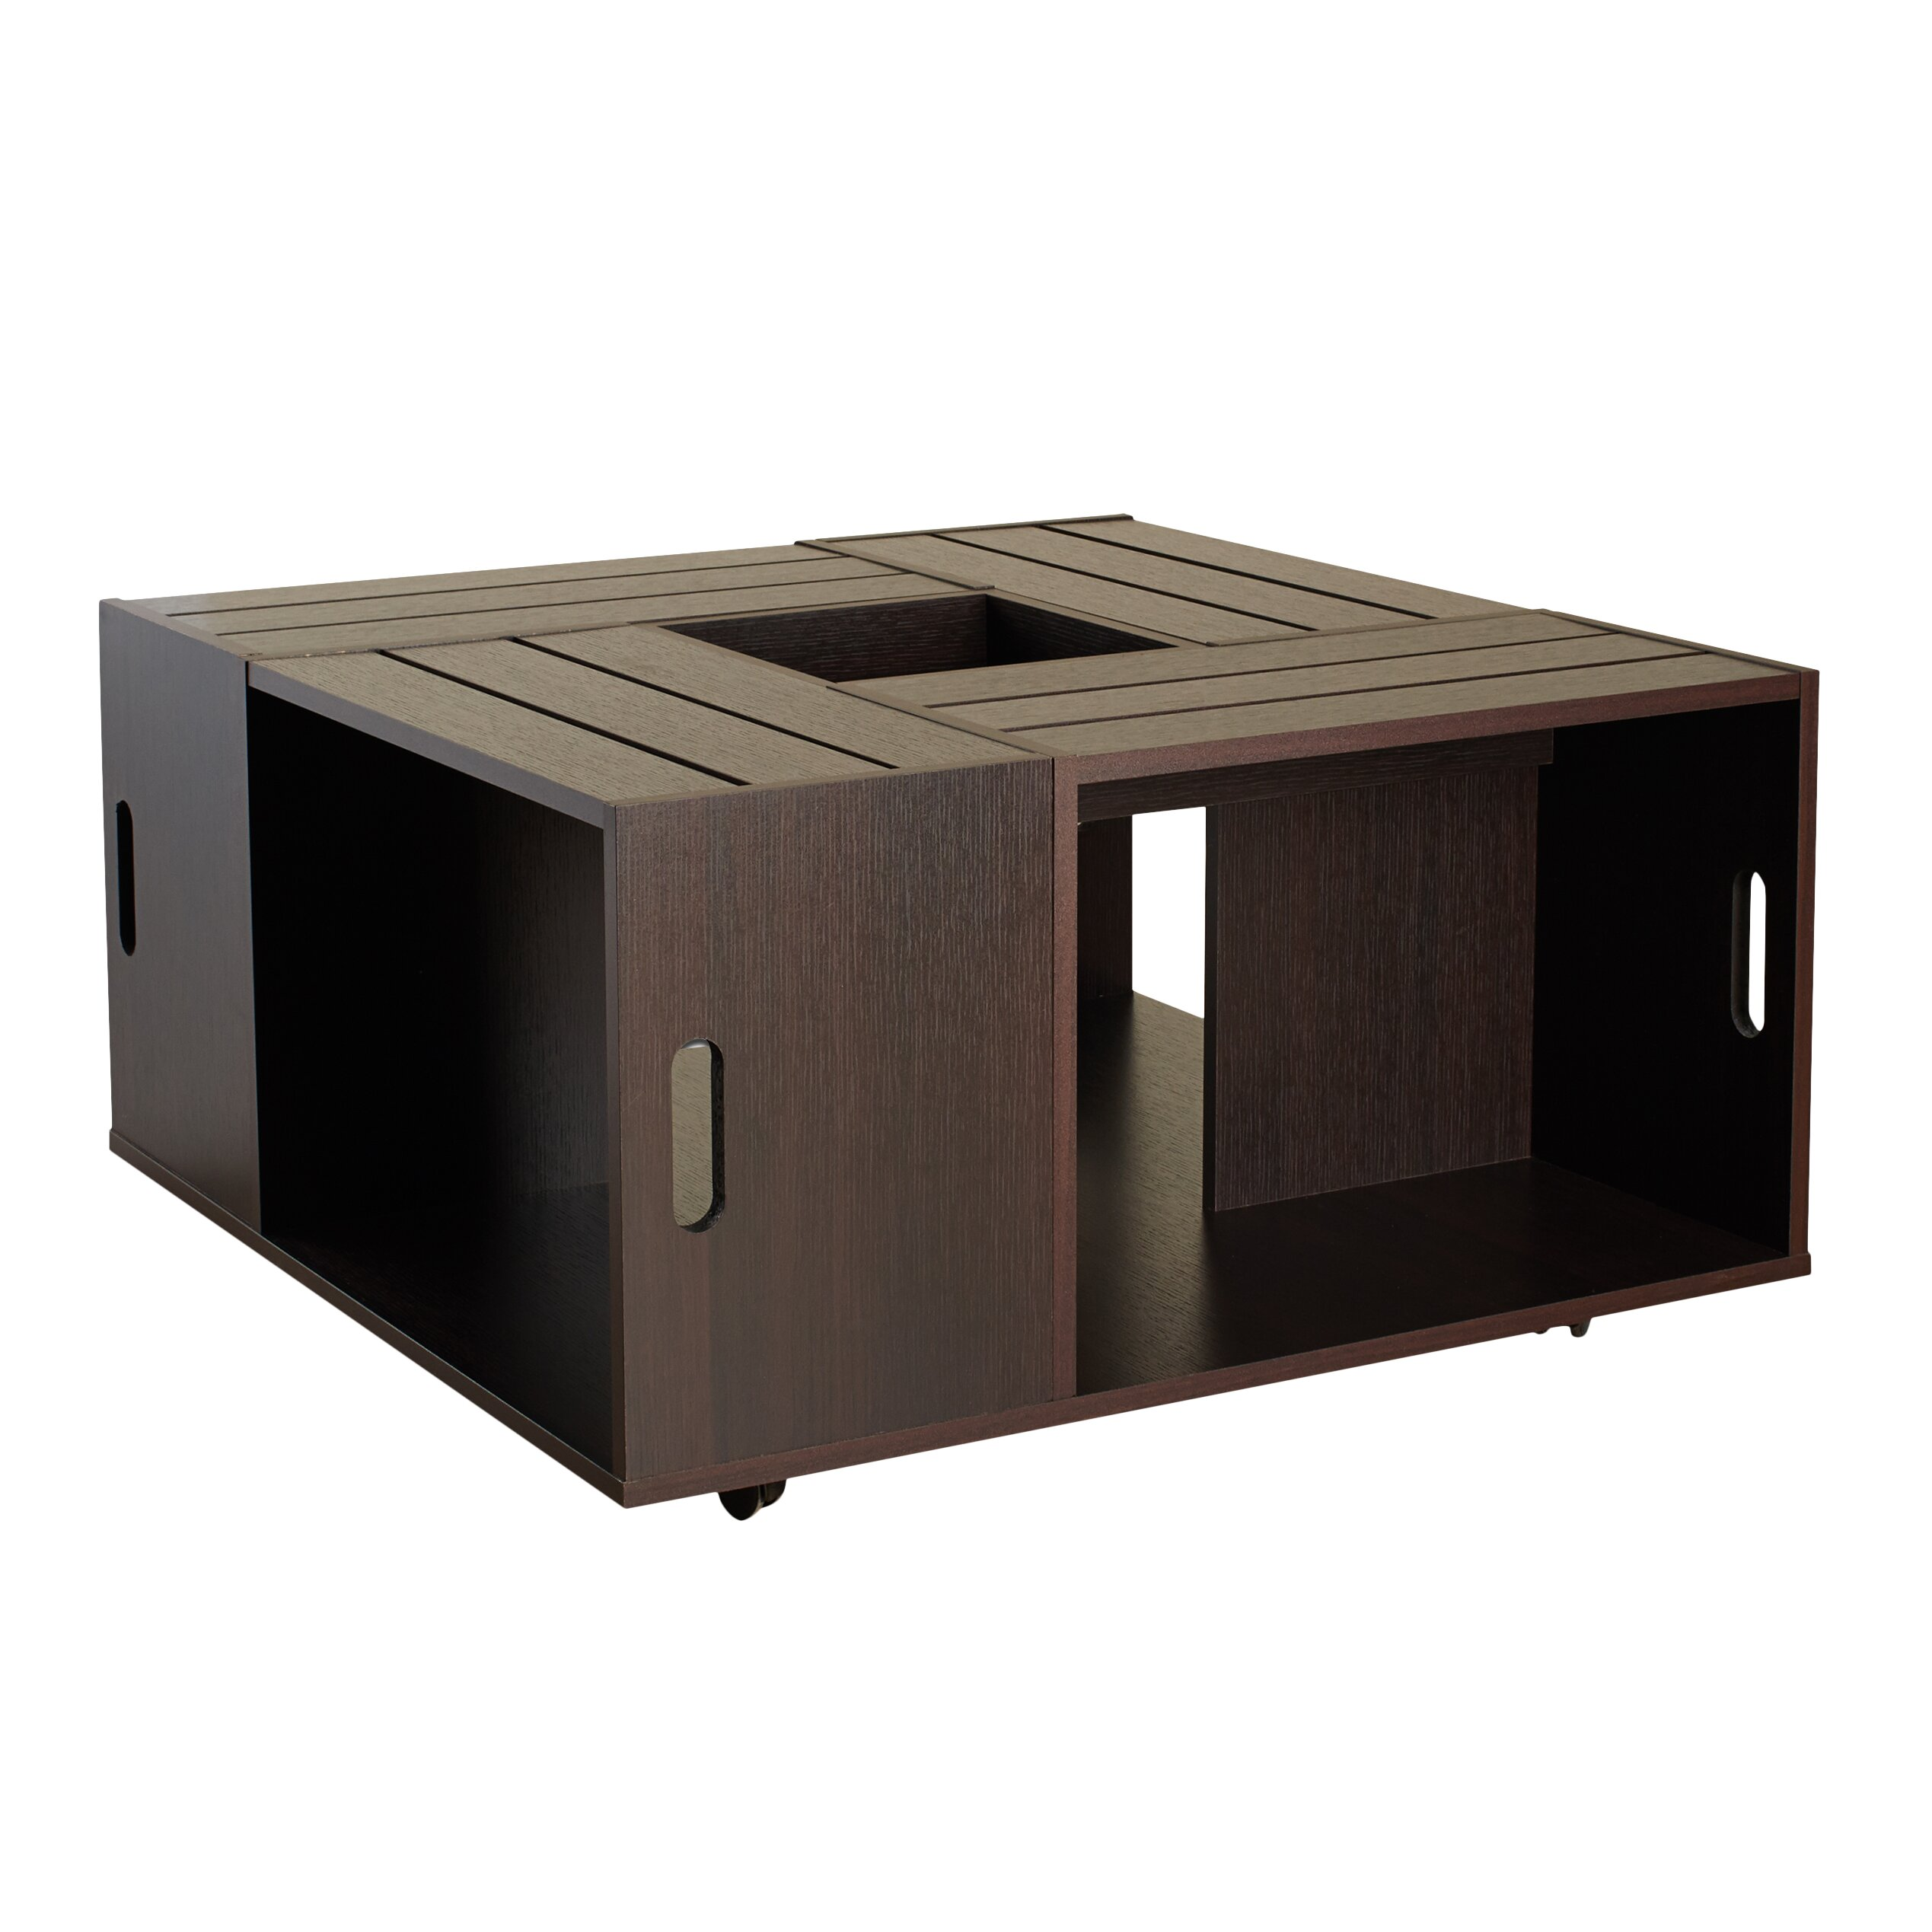 Square Coffee Table By Latitude Run: Hokku Designs Corsica Coffee Table & Reviews